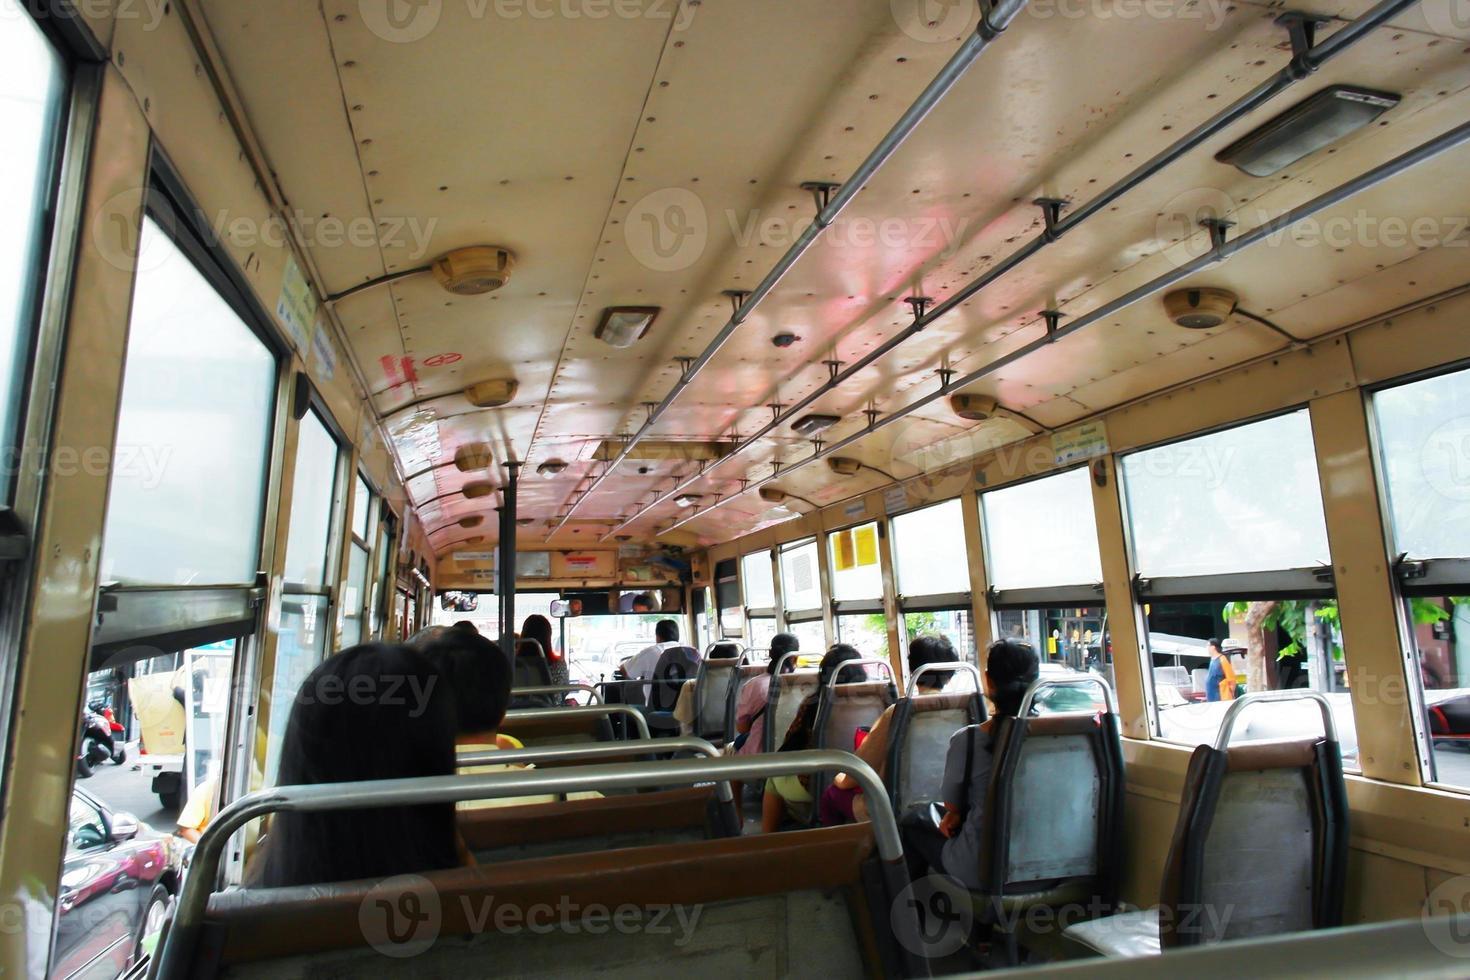 sull'autobus foto